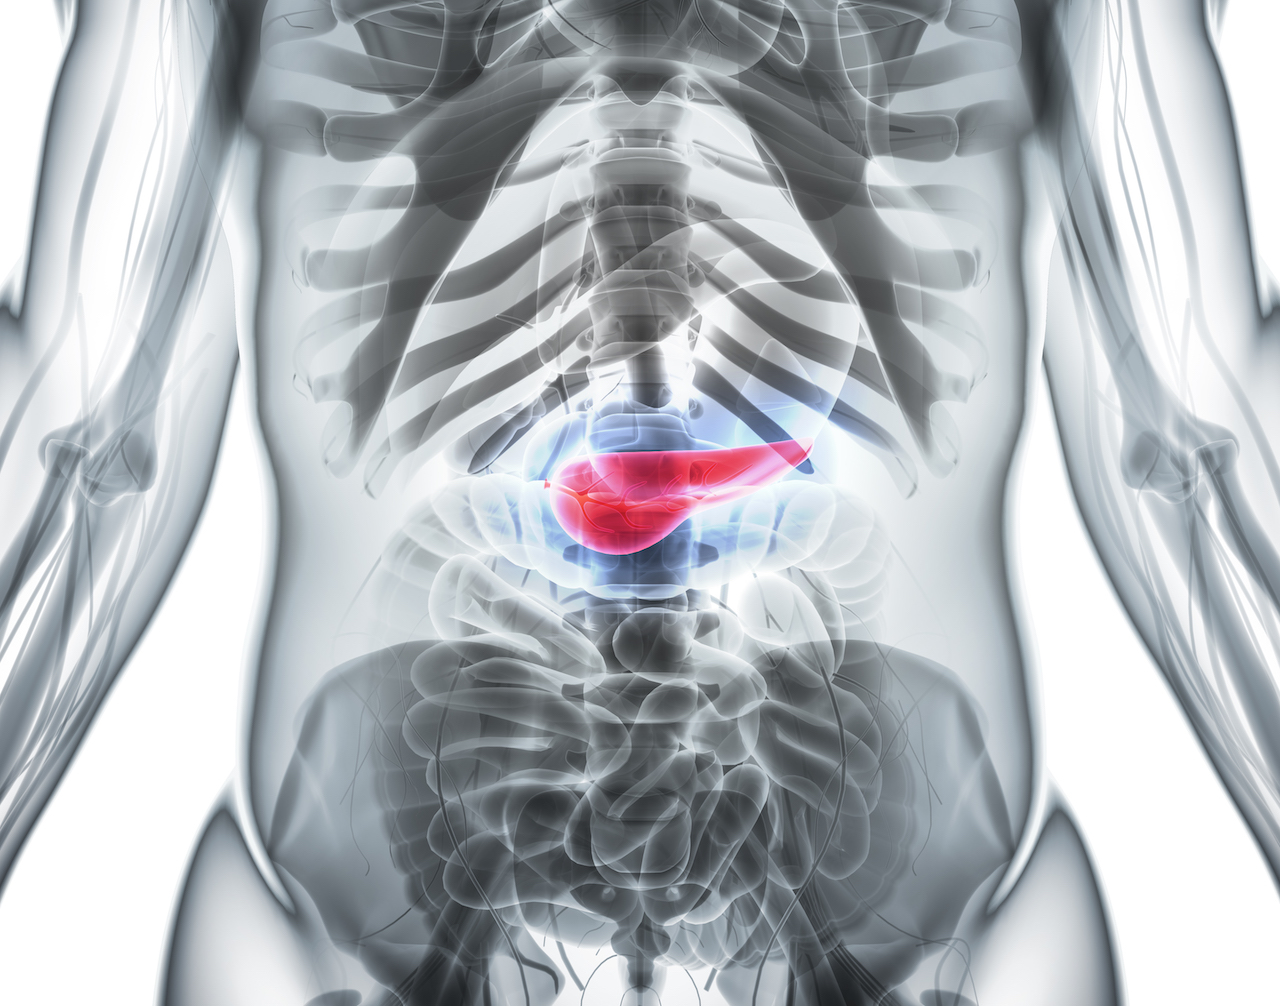 Coming Soon: The Artificial Pancreas